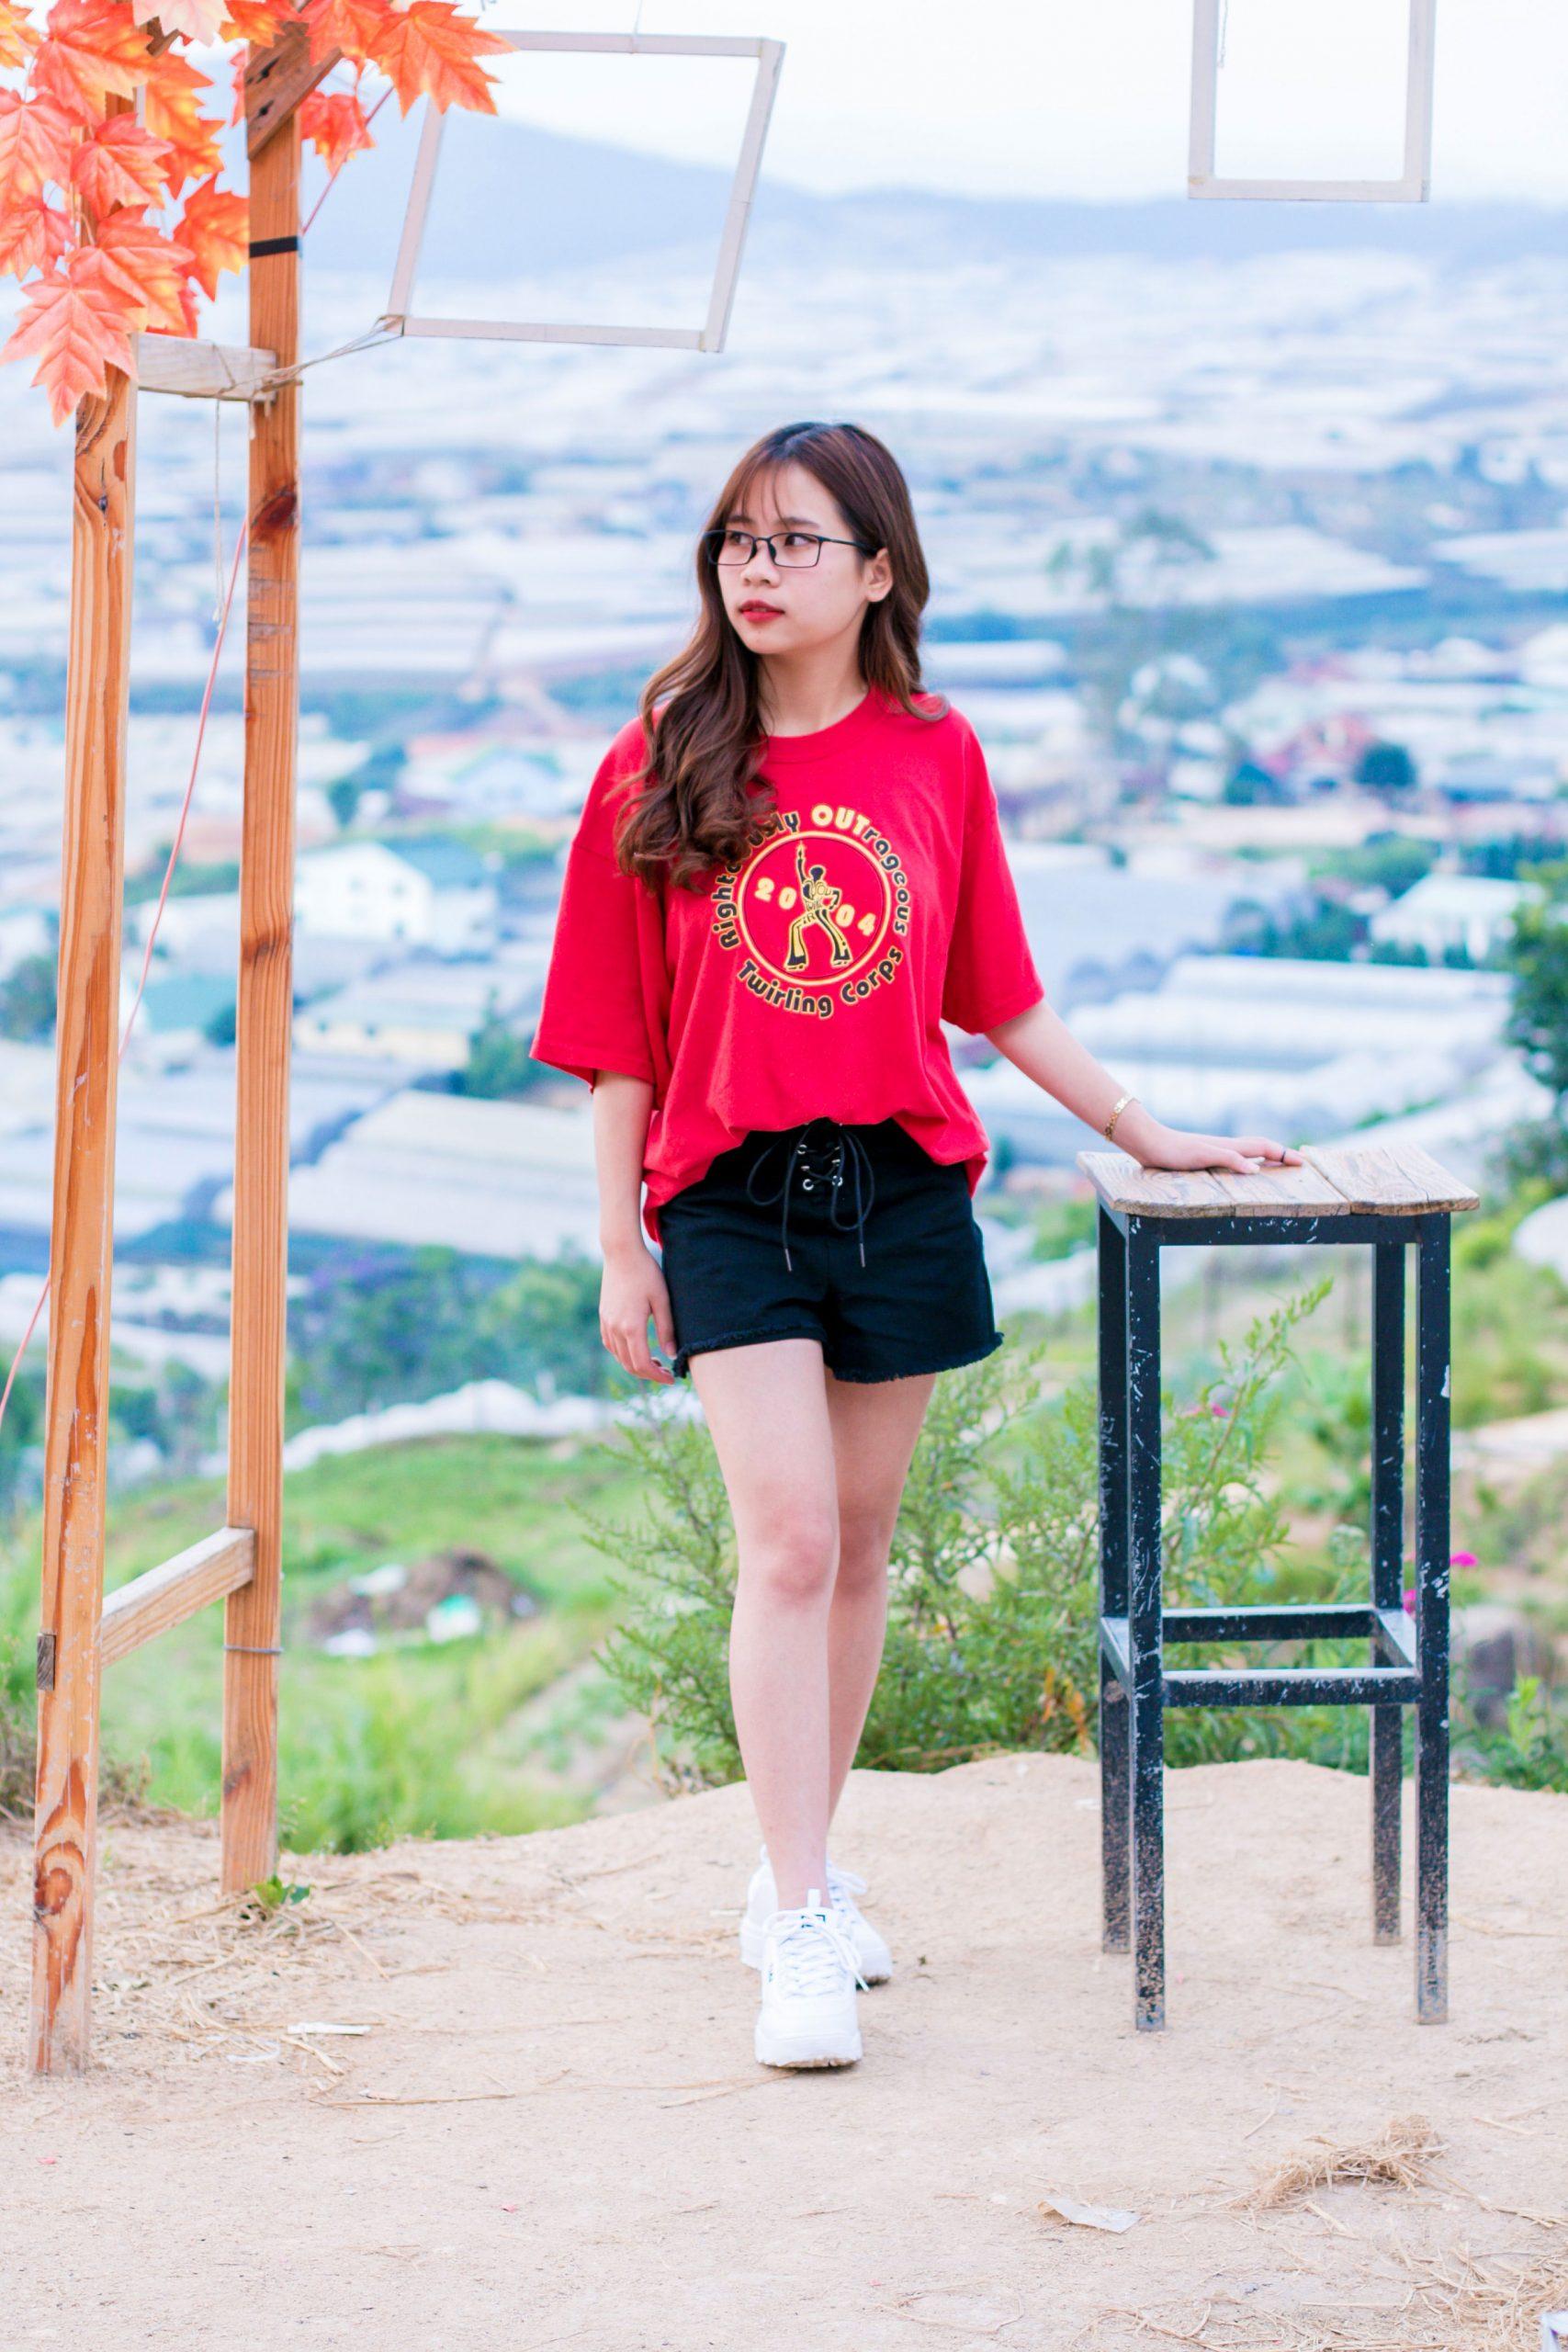 2021 Very Sad Girl Whatsapp Dp Images free hd